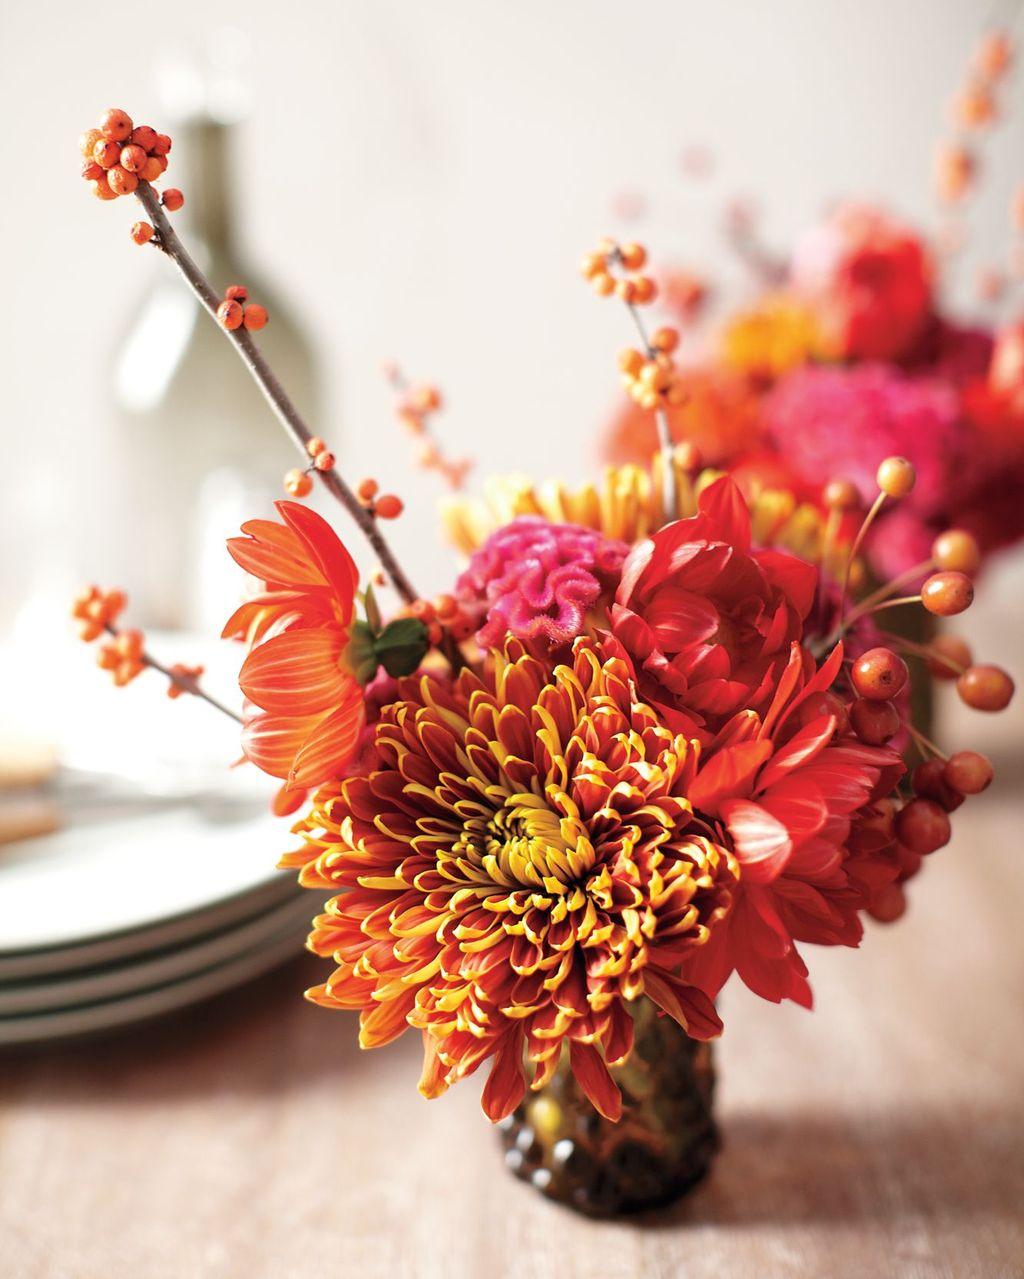 Beautiful Fall Flower Arrangement Design Ideas For Living Room Decor 02